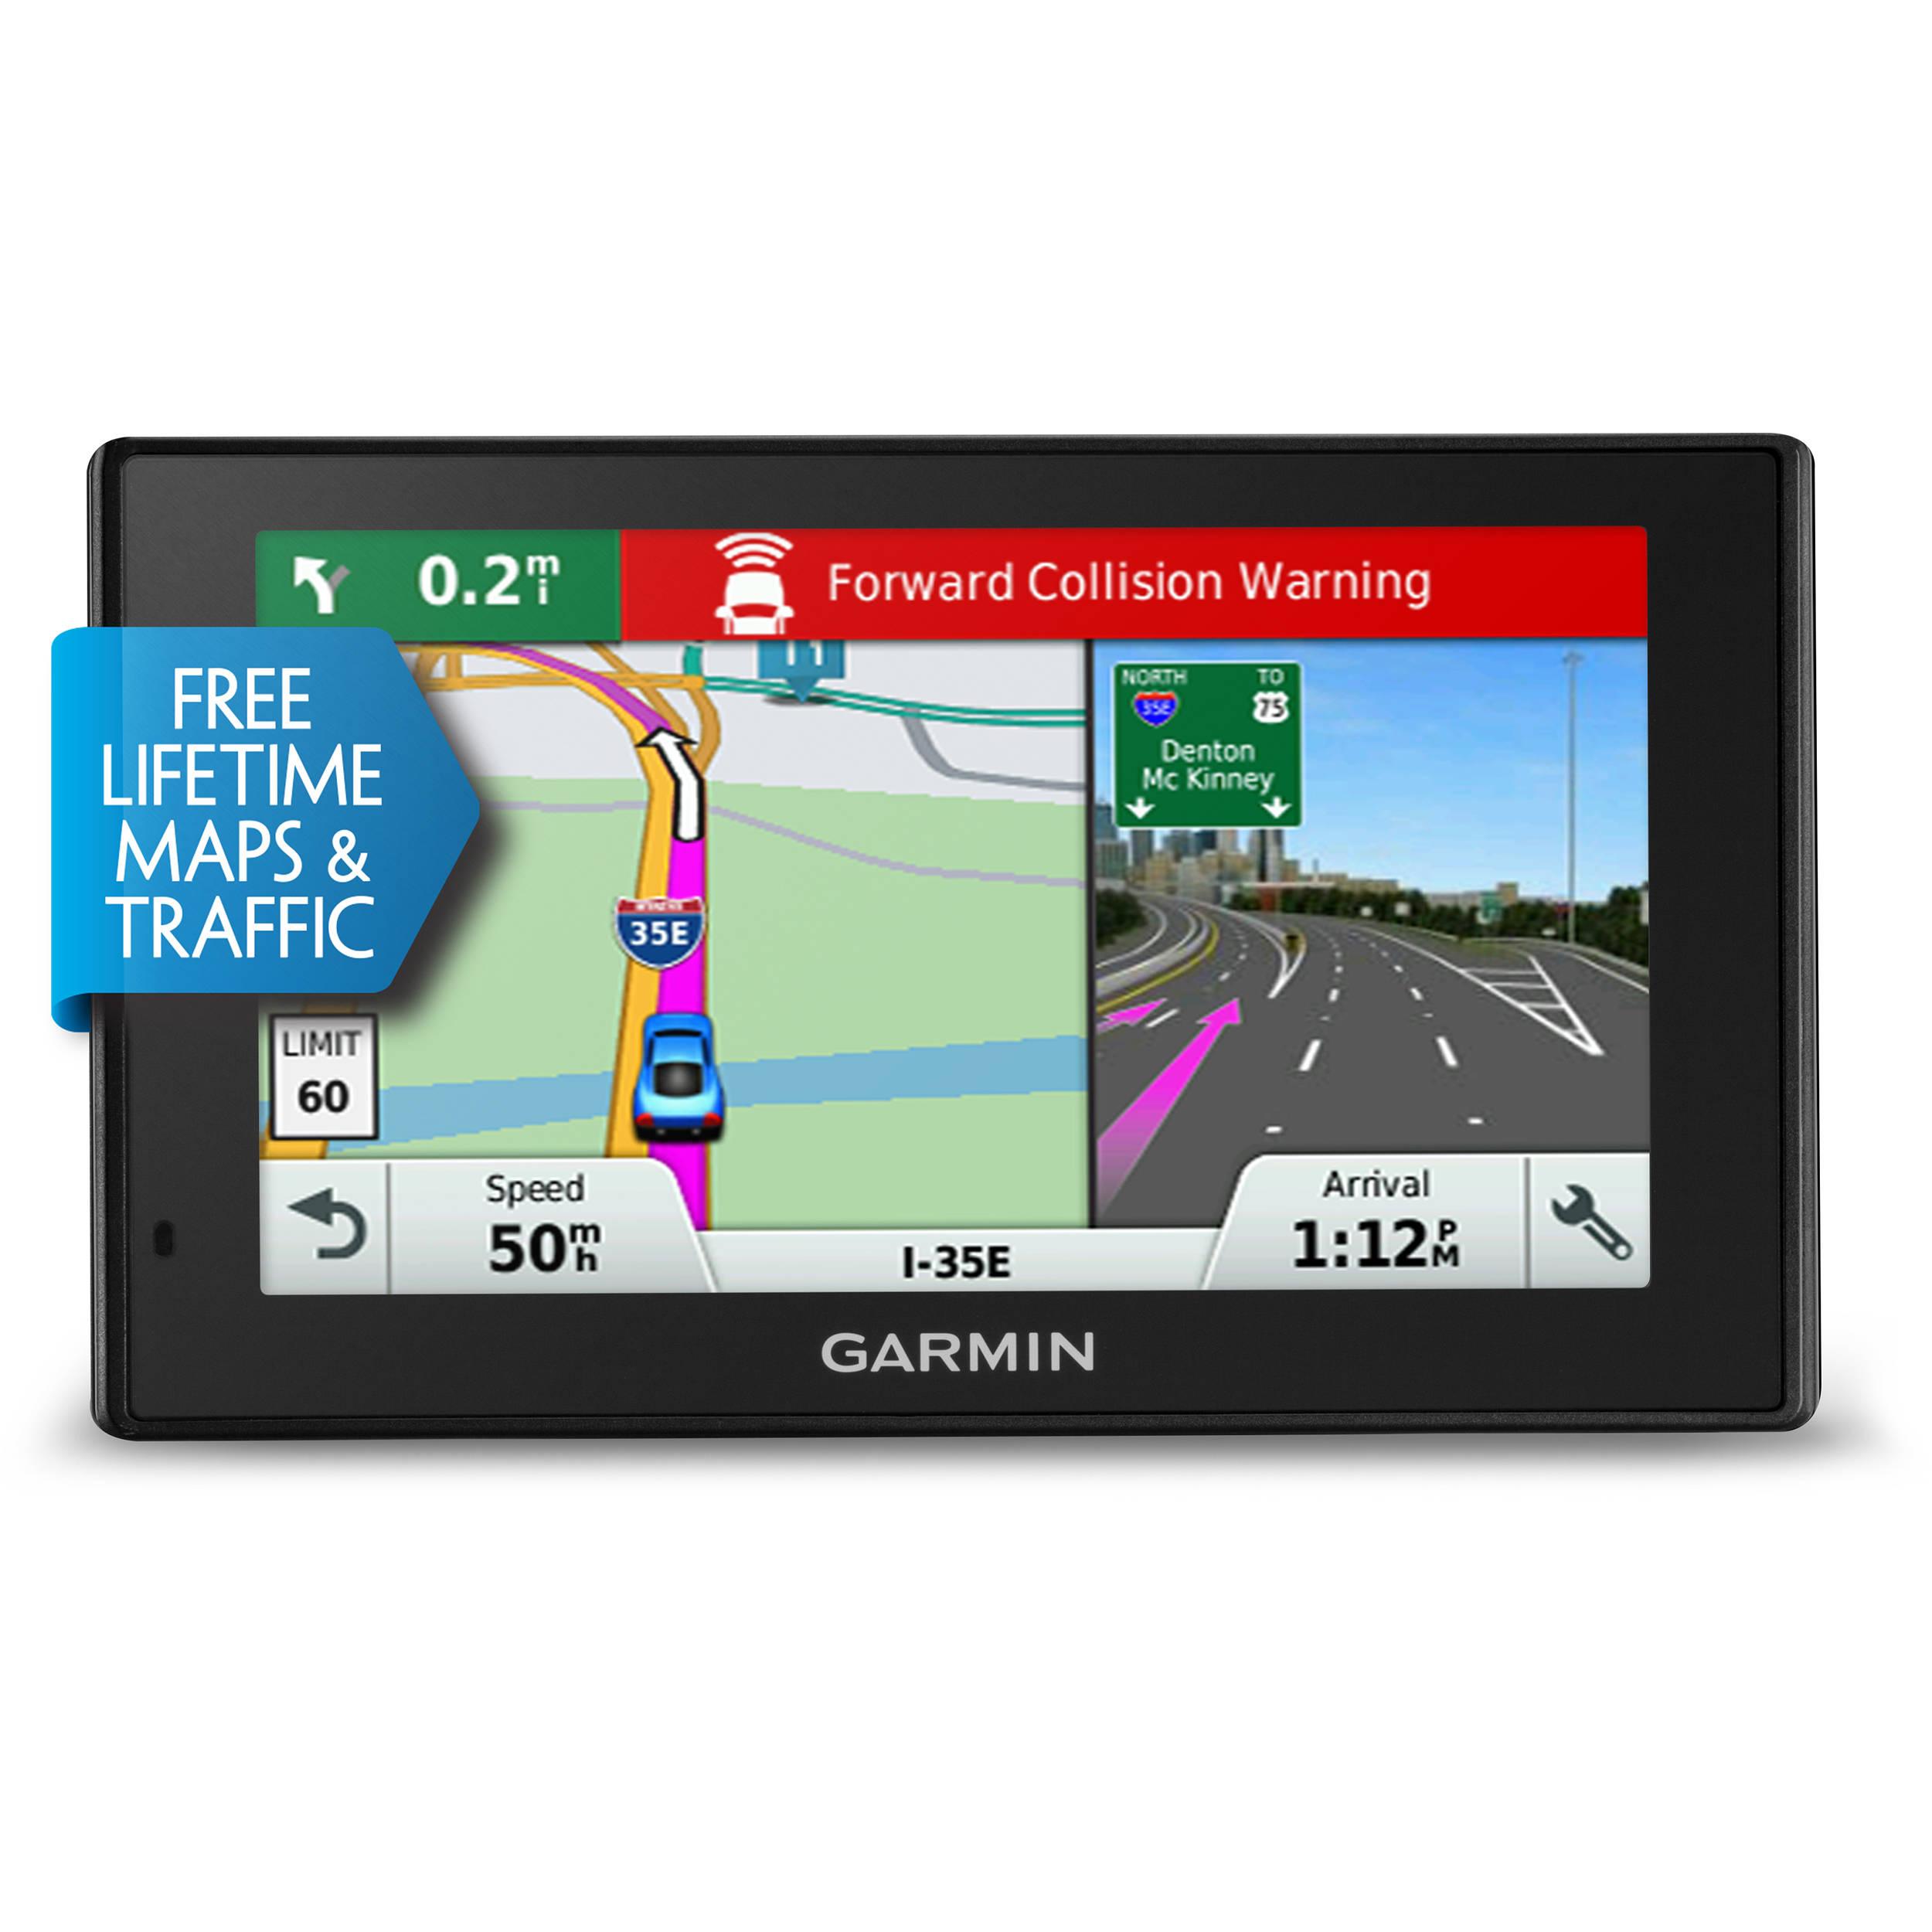 Garmin driveassist 50 lmt navigation system with dash cam